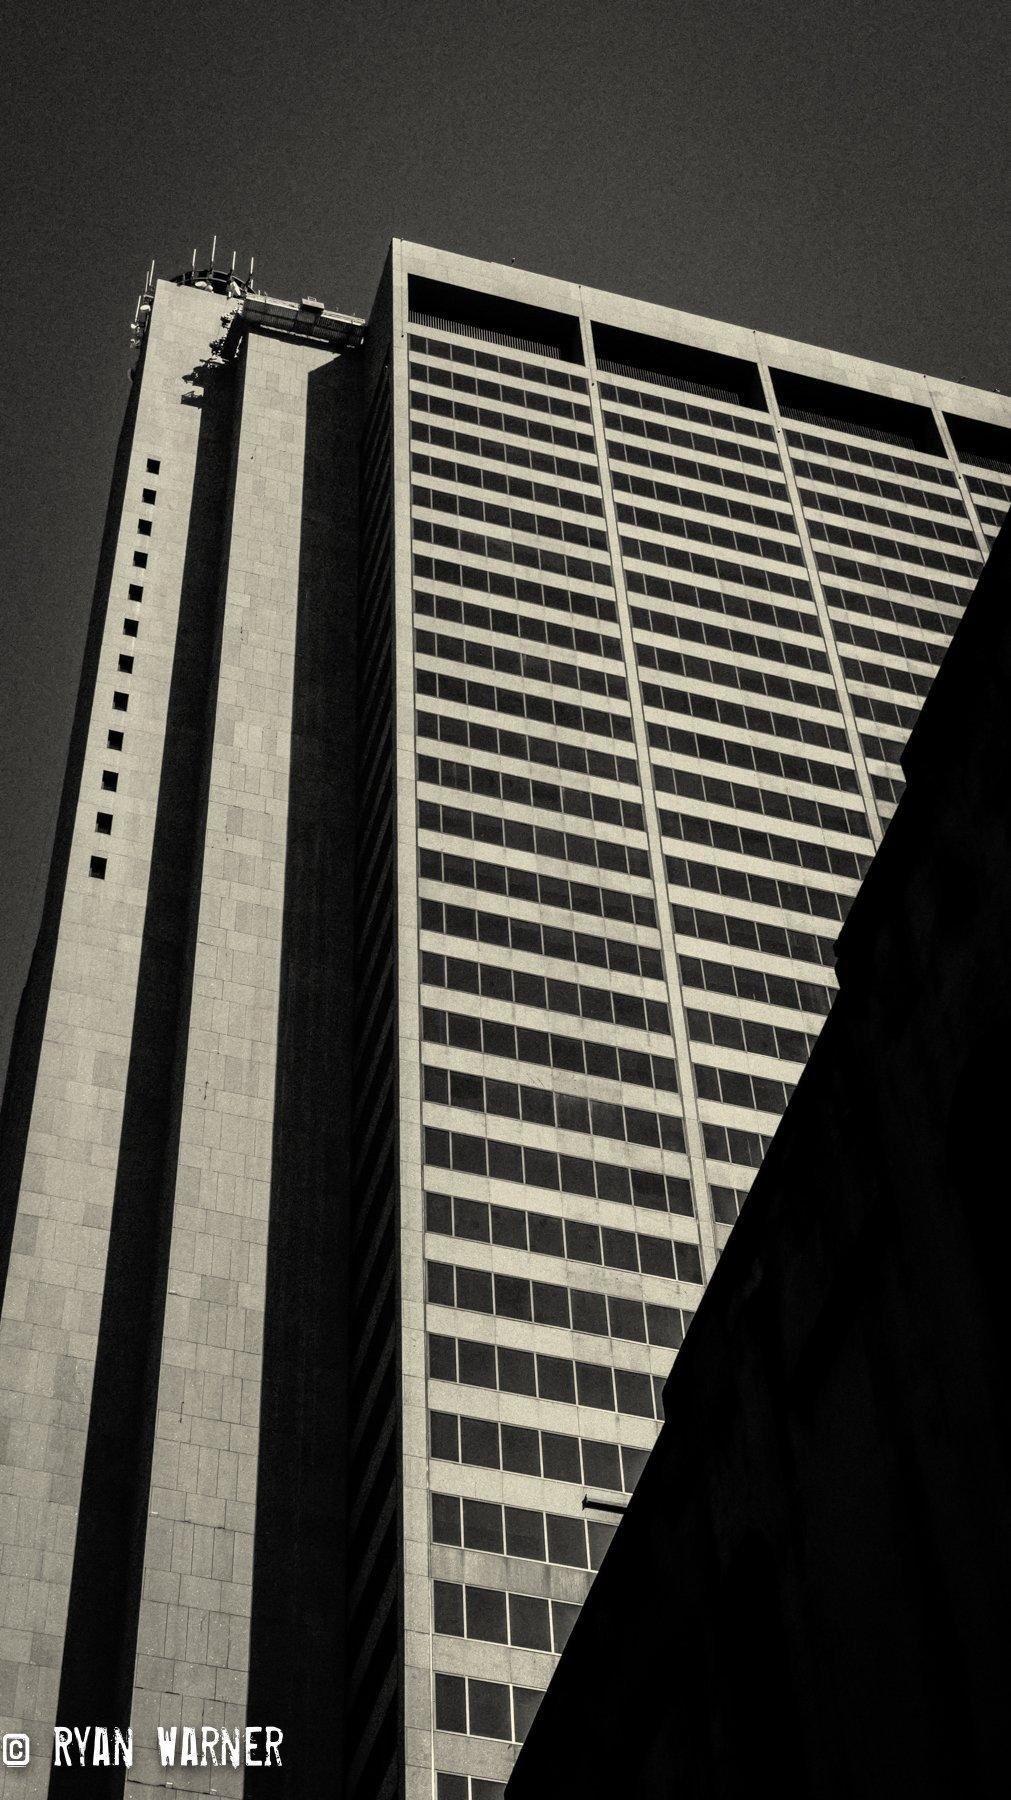 Ryan Warner - Buildings #2 - Photography - Columbus, Ohio